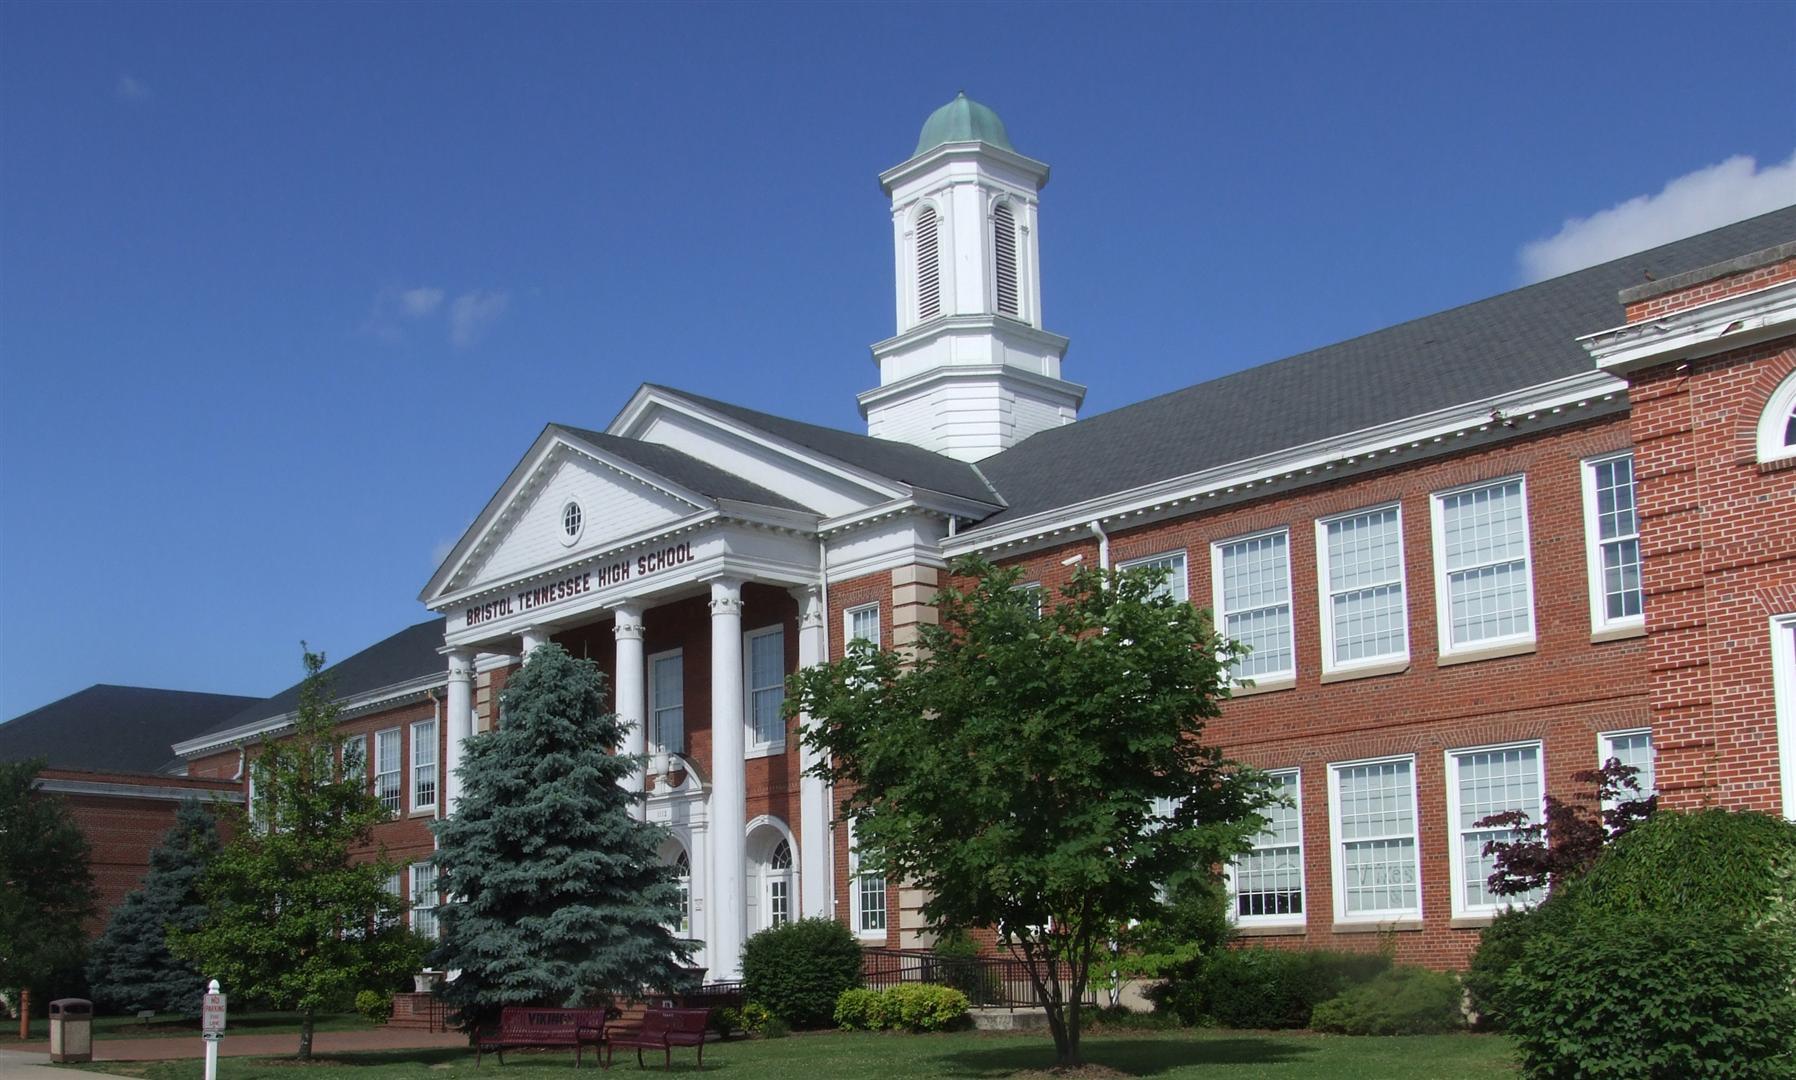 Tennessee High School Viking Hall Natatorium